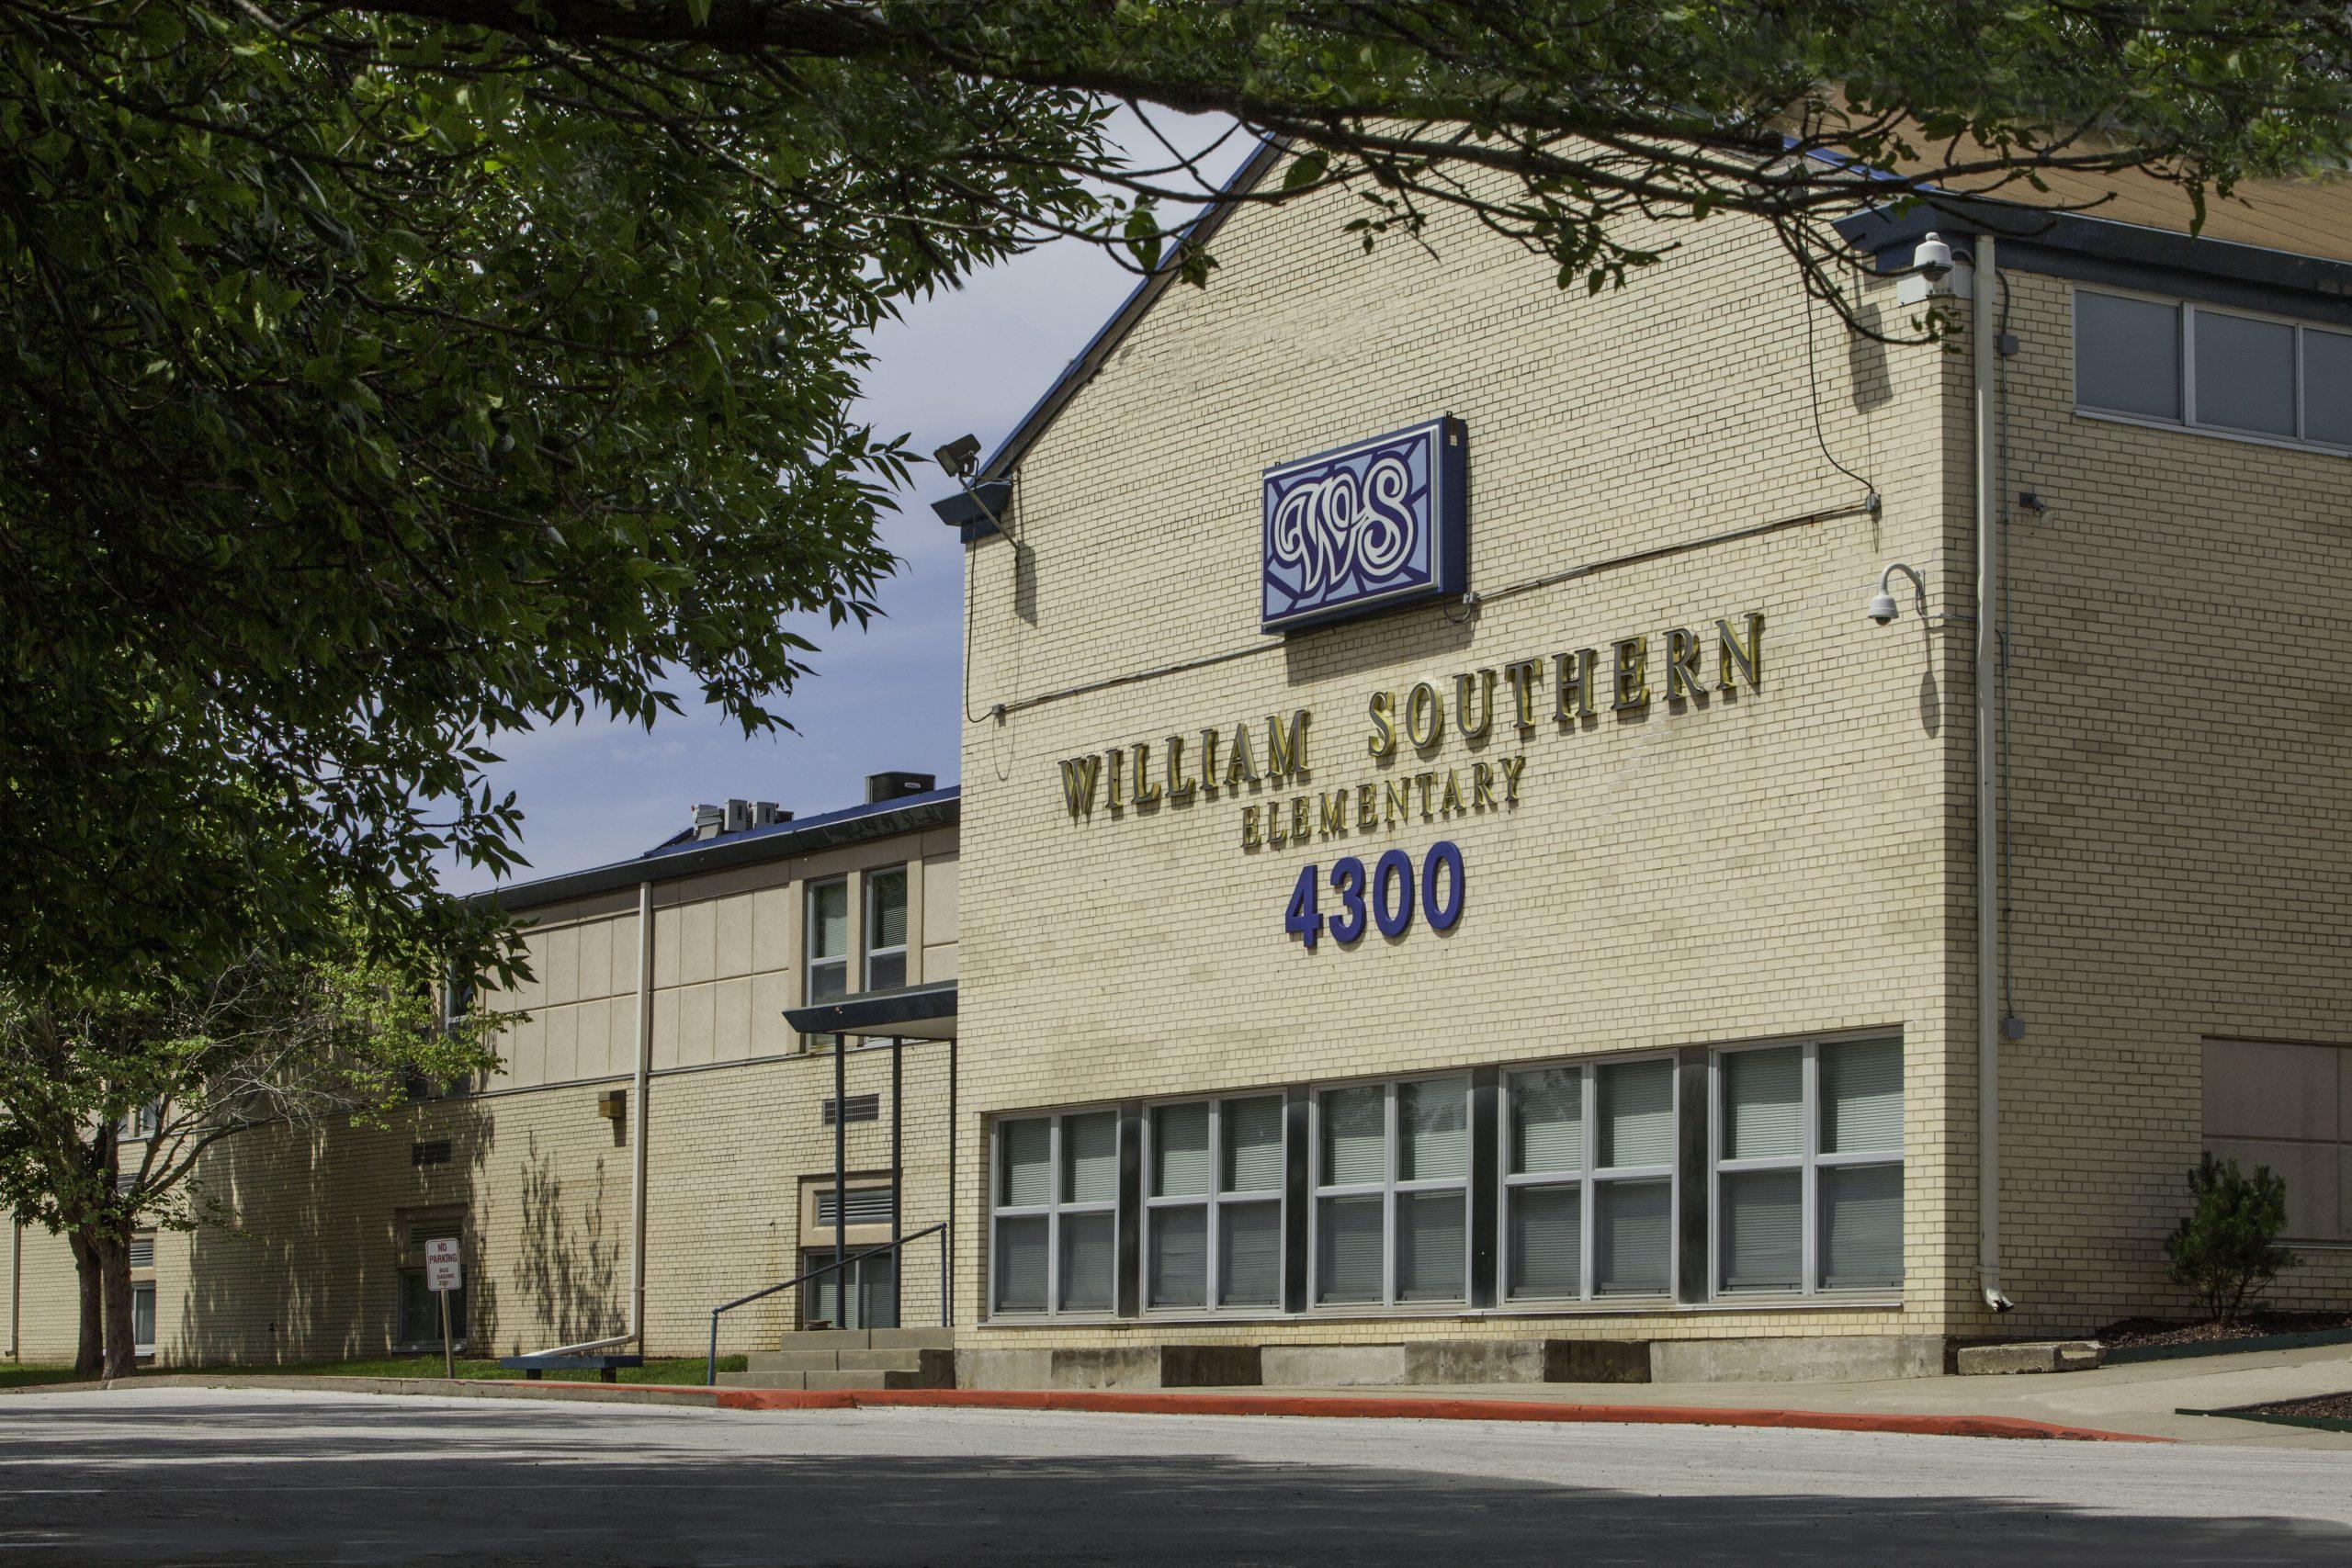 William Southern Elementary School Inside School Break For Independence. Missouri Schools